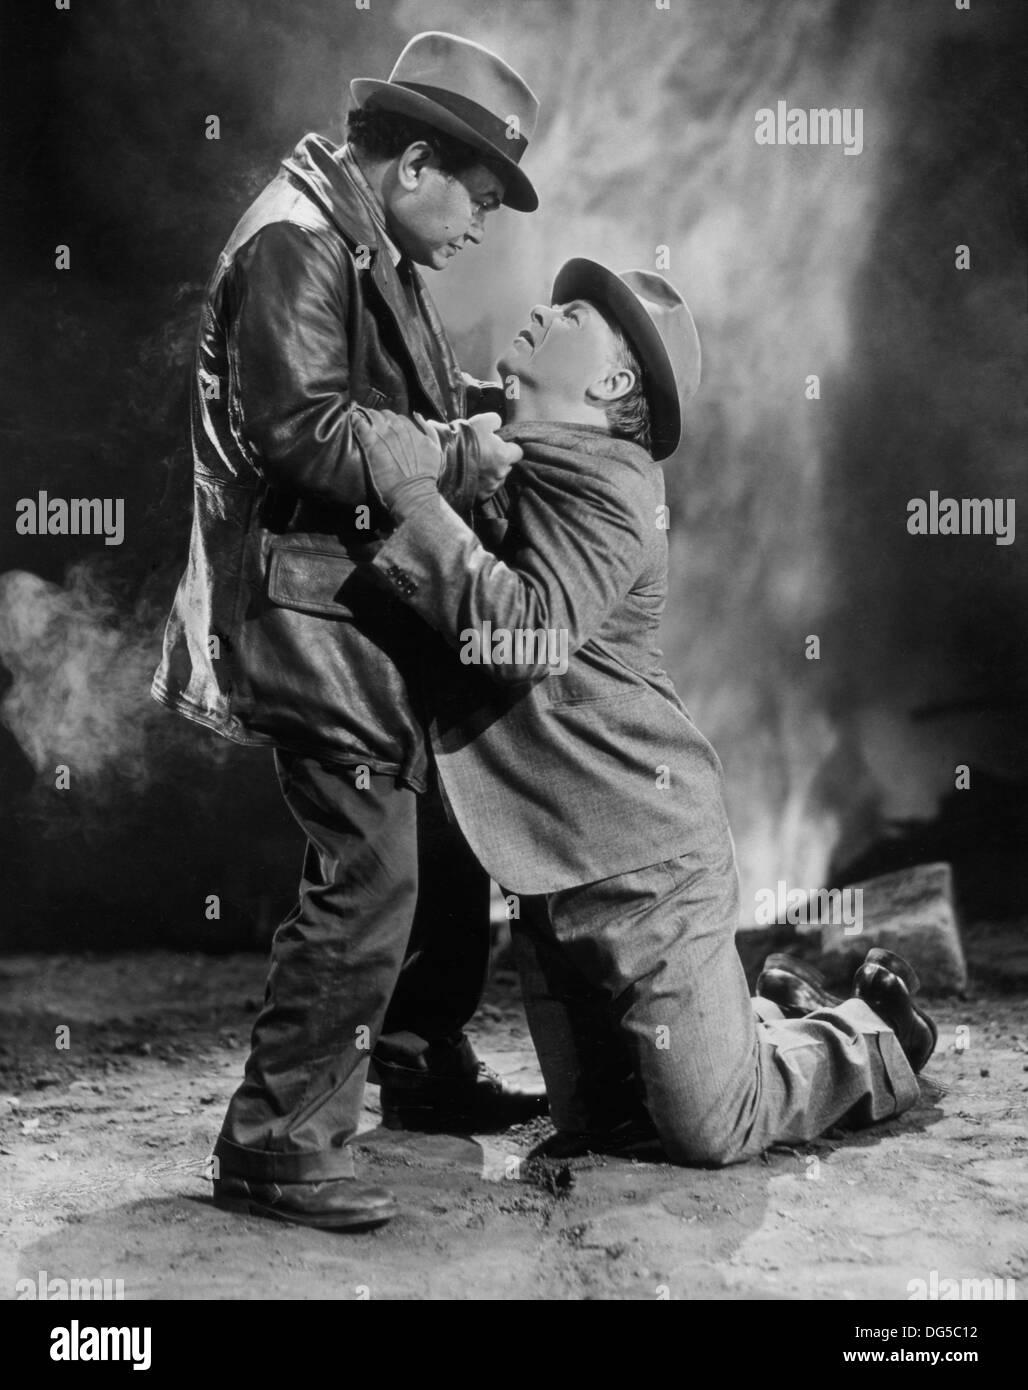 Edward G. Robinson (Left), On-Set of the Film, 'Tales of Manhattan', 20th Century Fox, 1942 - Stock Image